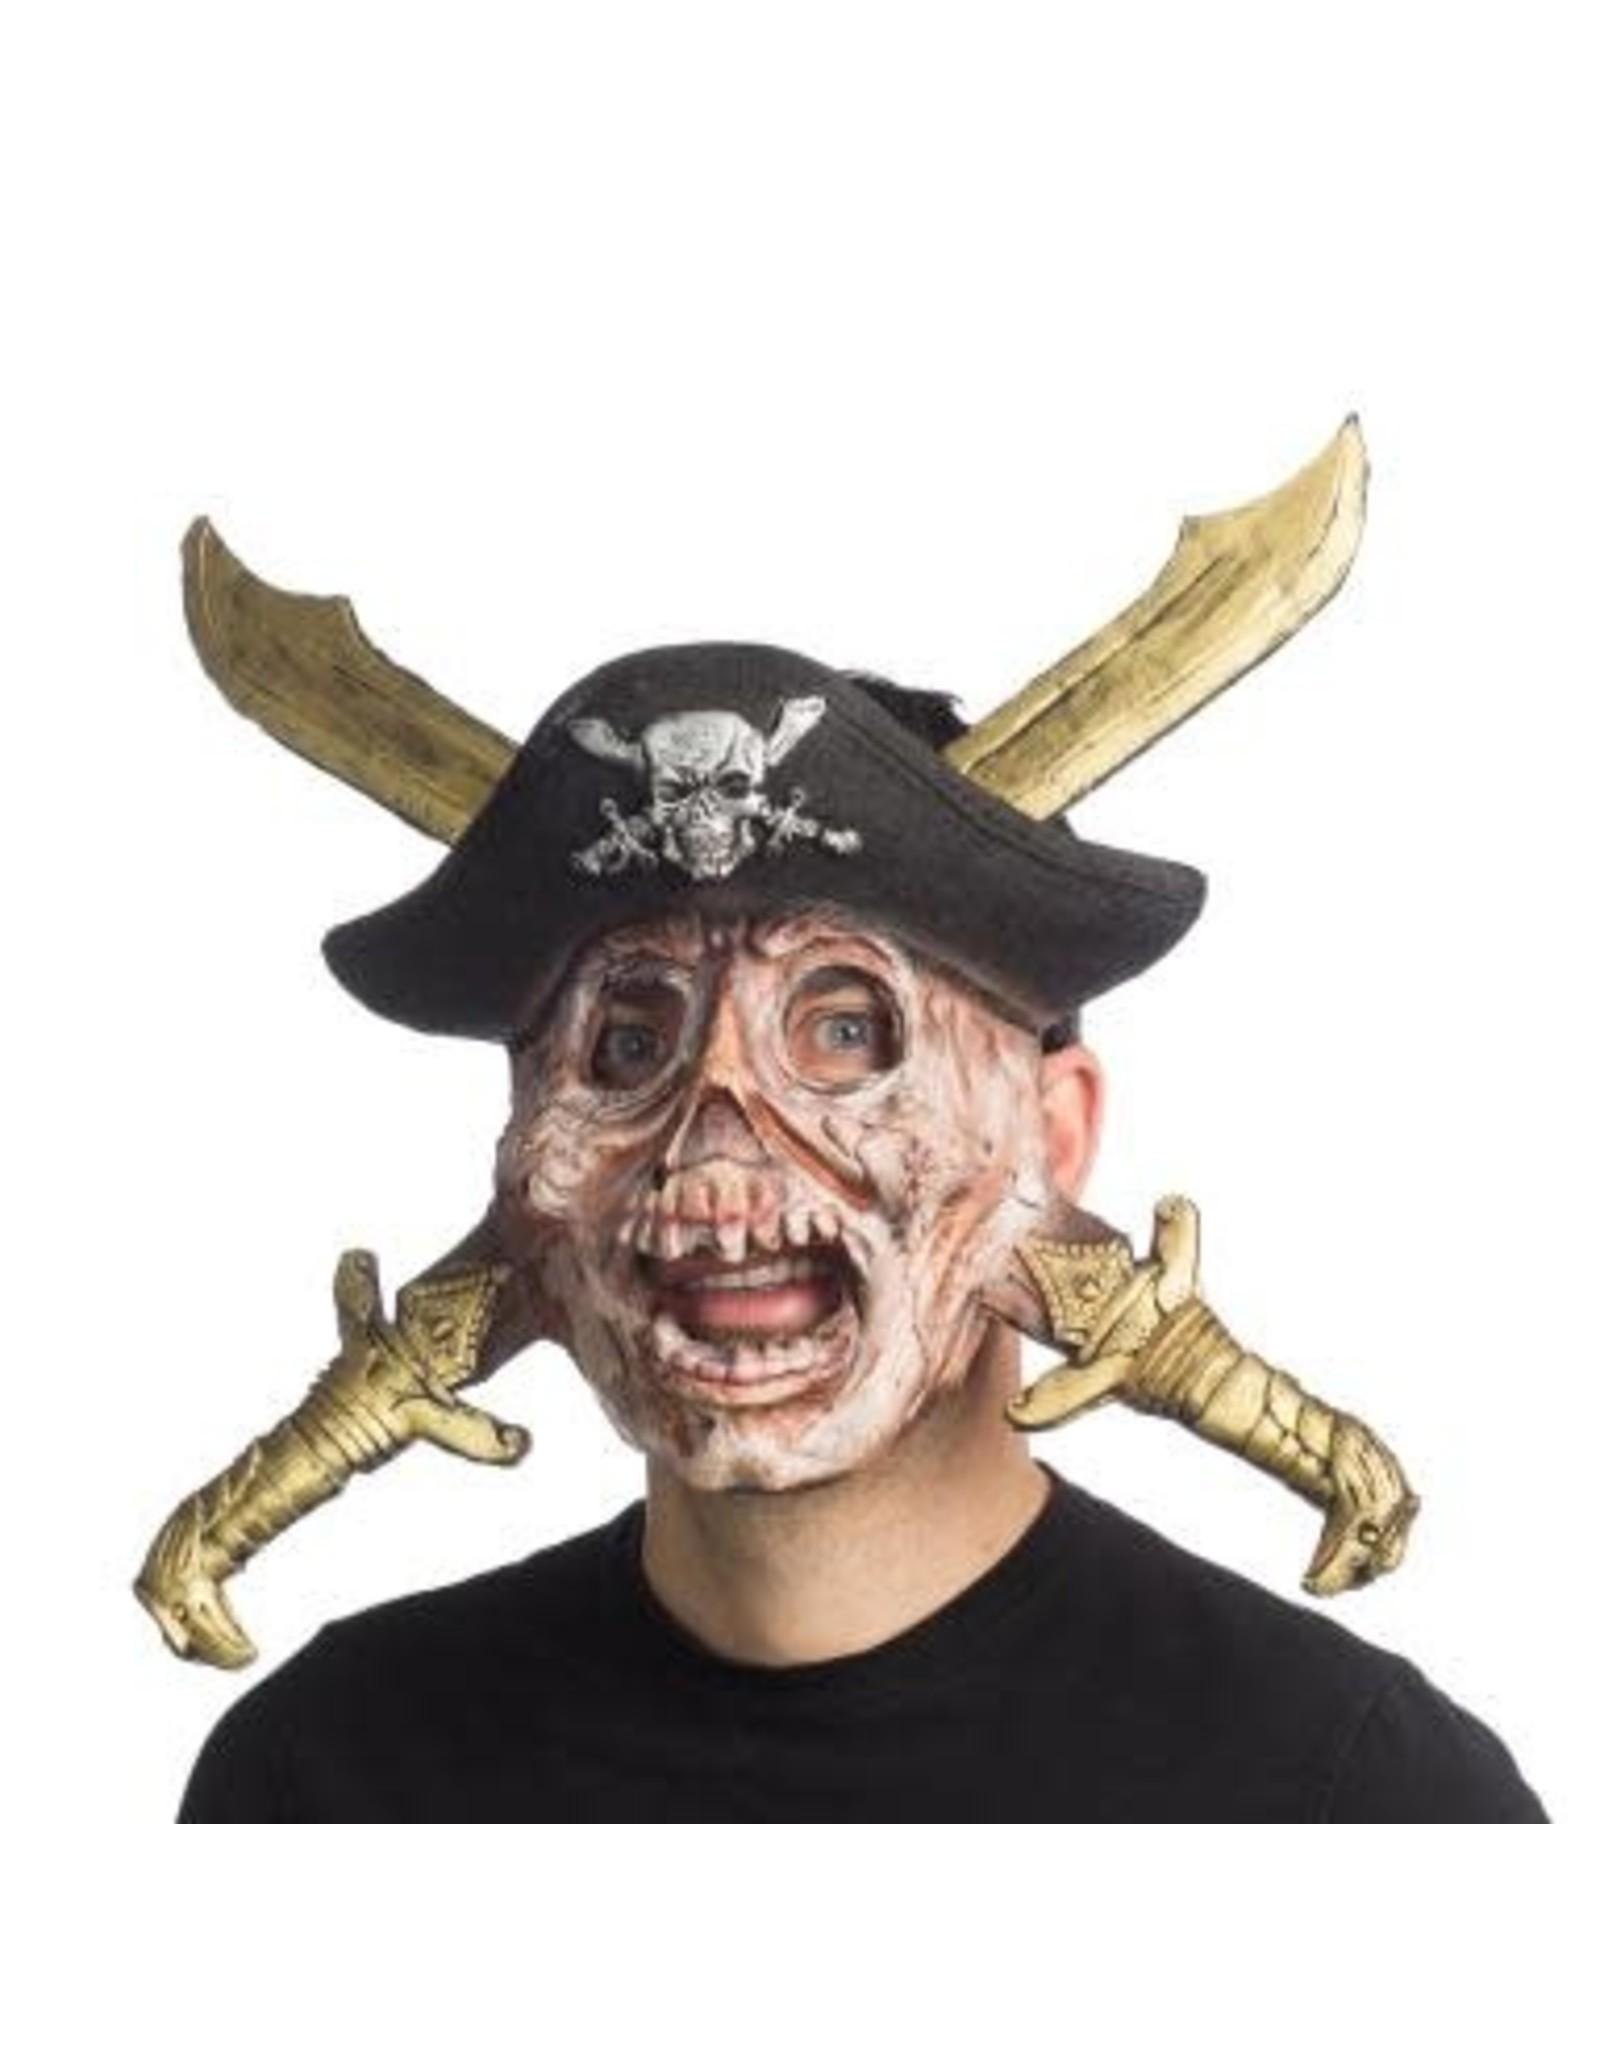 HM Smallwares Pirate Mask